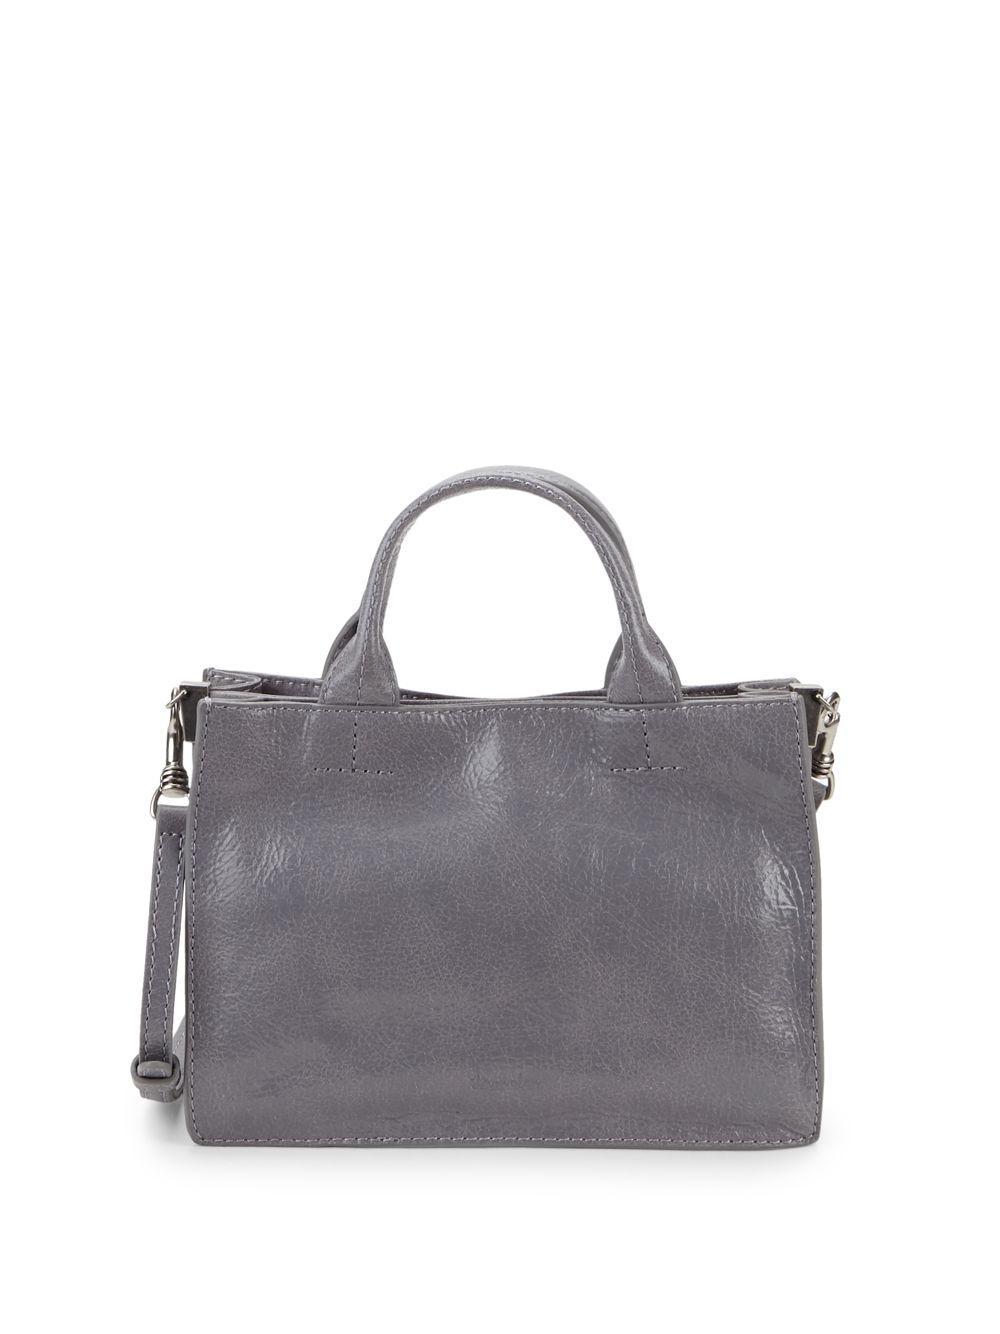 d7b610763028 Lyst - Steven Alan Classic Leather Crossbody Bag in Gray